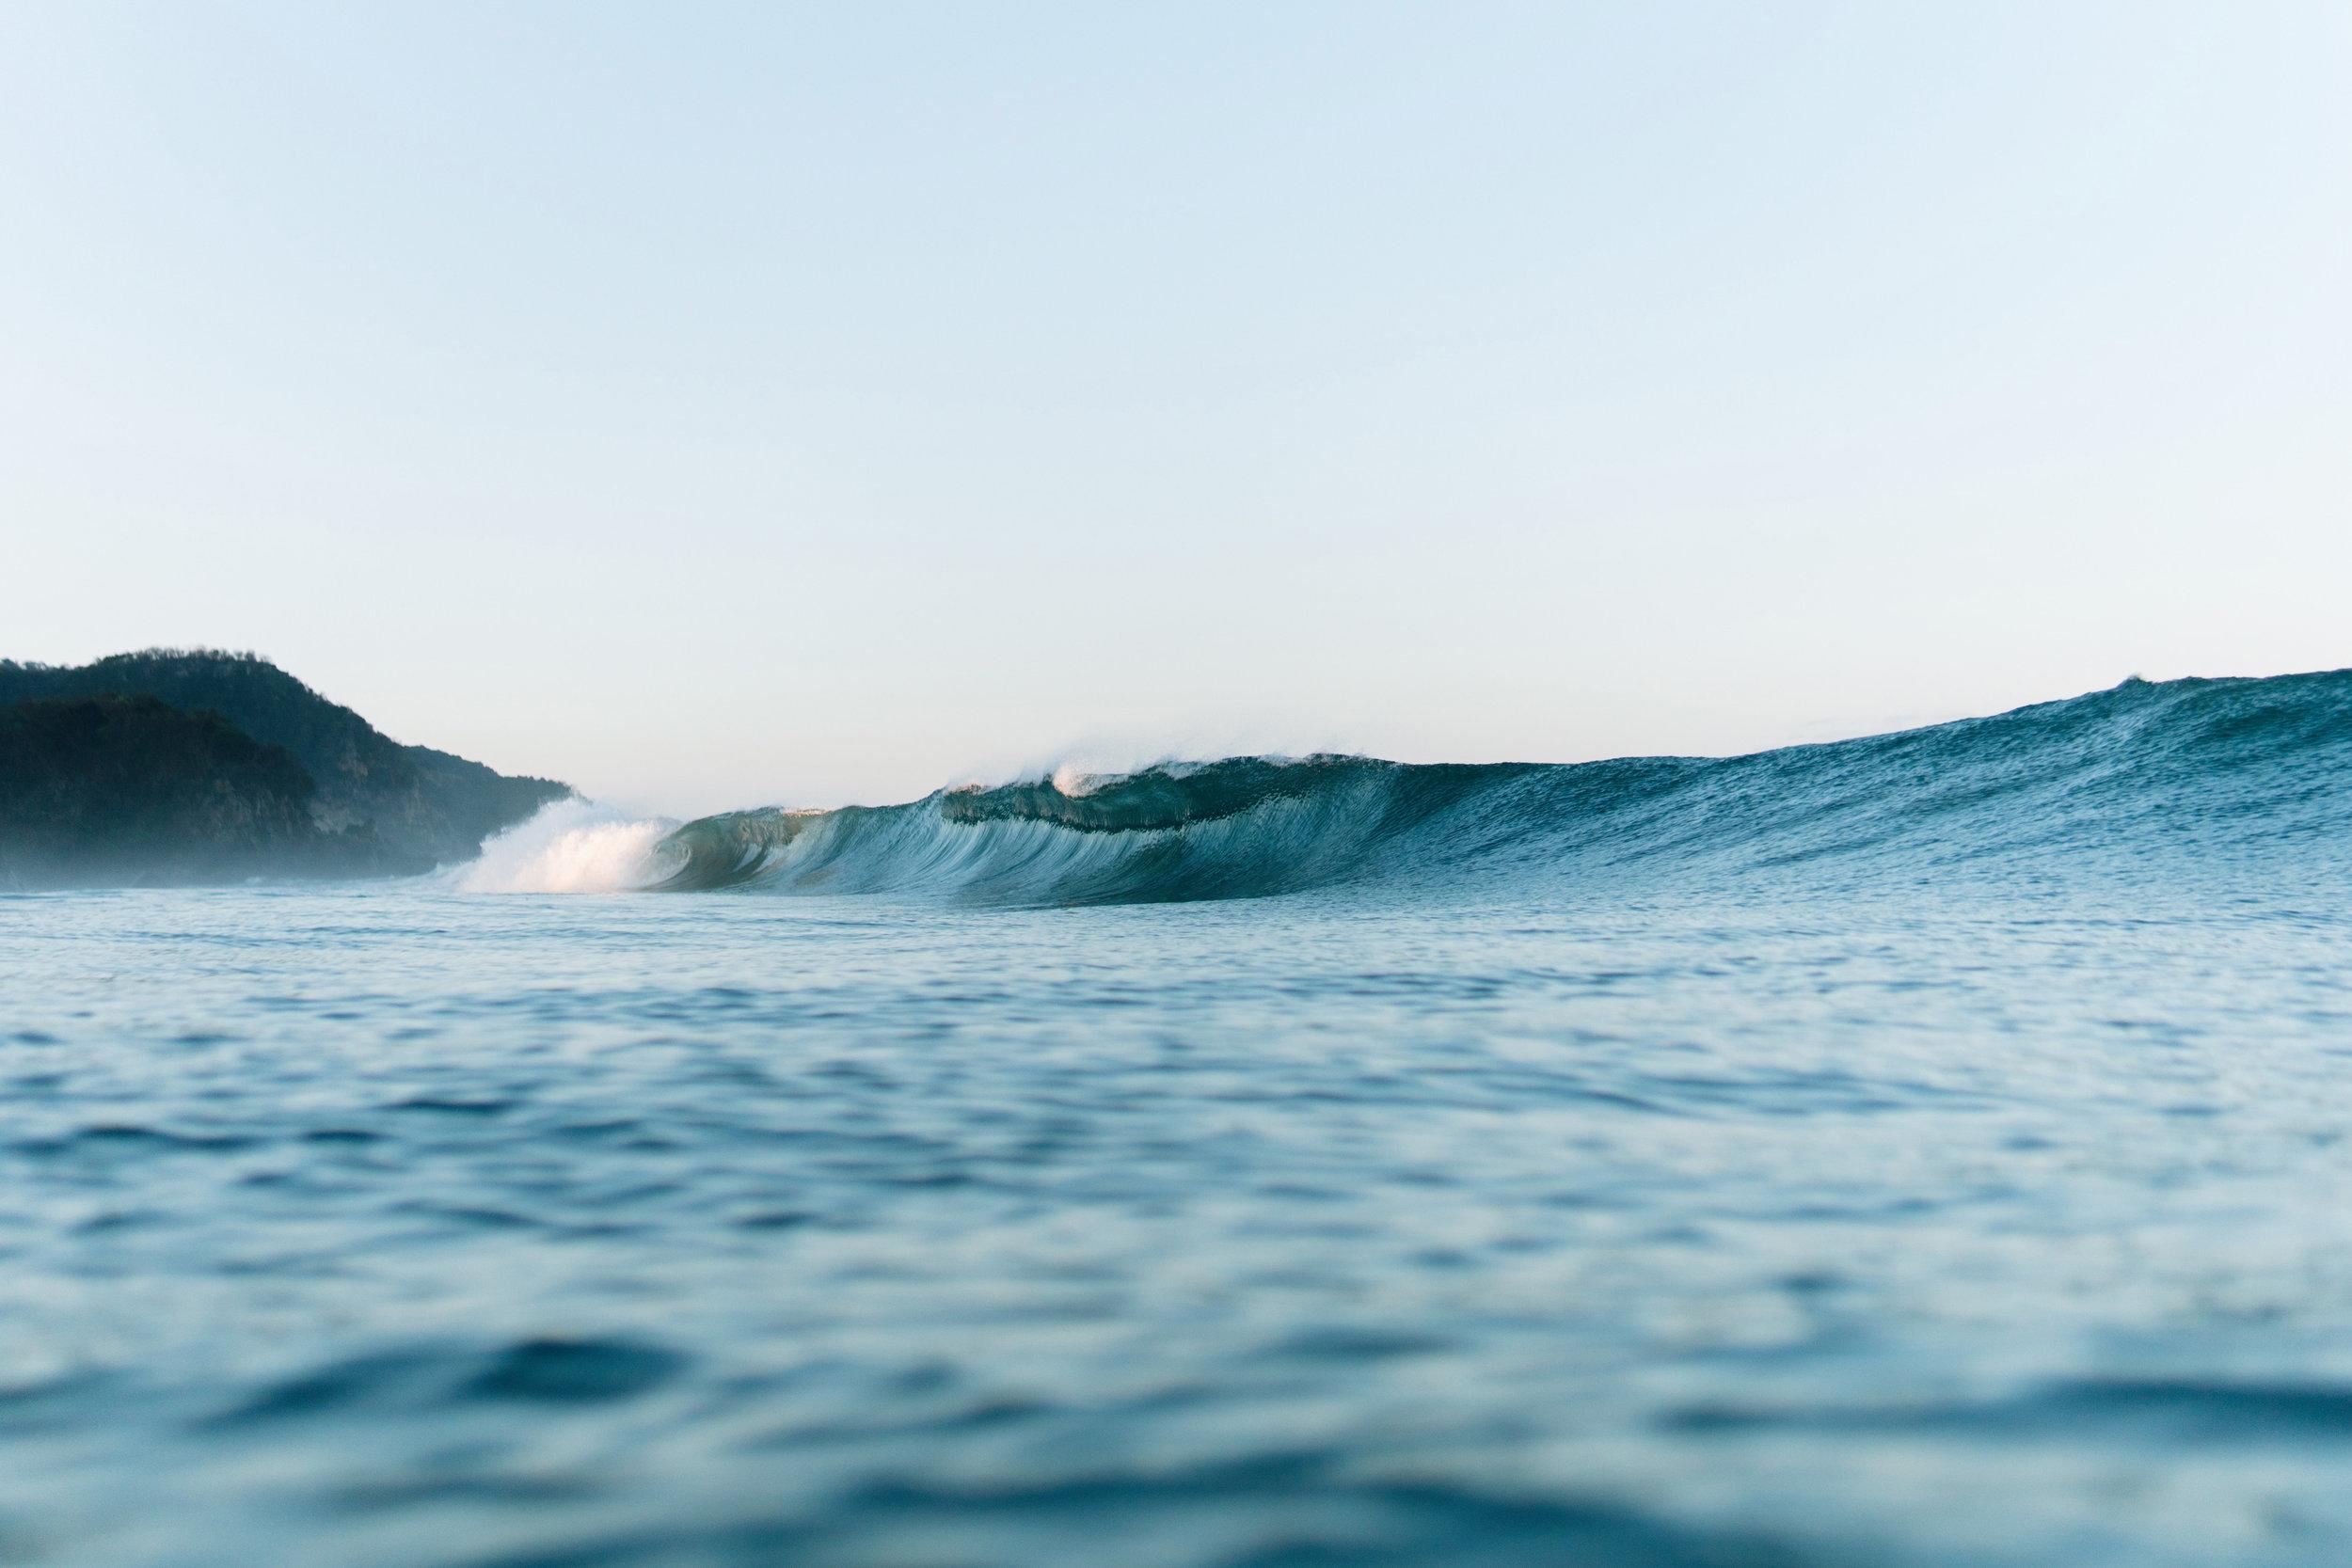 Sayulita-Mexico-Surf-Diego-Cadena-Kalle-Carranza-Dylan-Southworth-Gato-Rodriguez-Julien-Dorian-Gomez-Heiko-Bothe-2.jpg